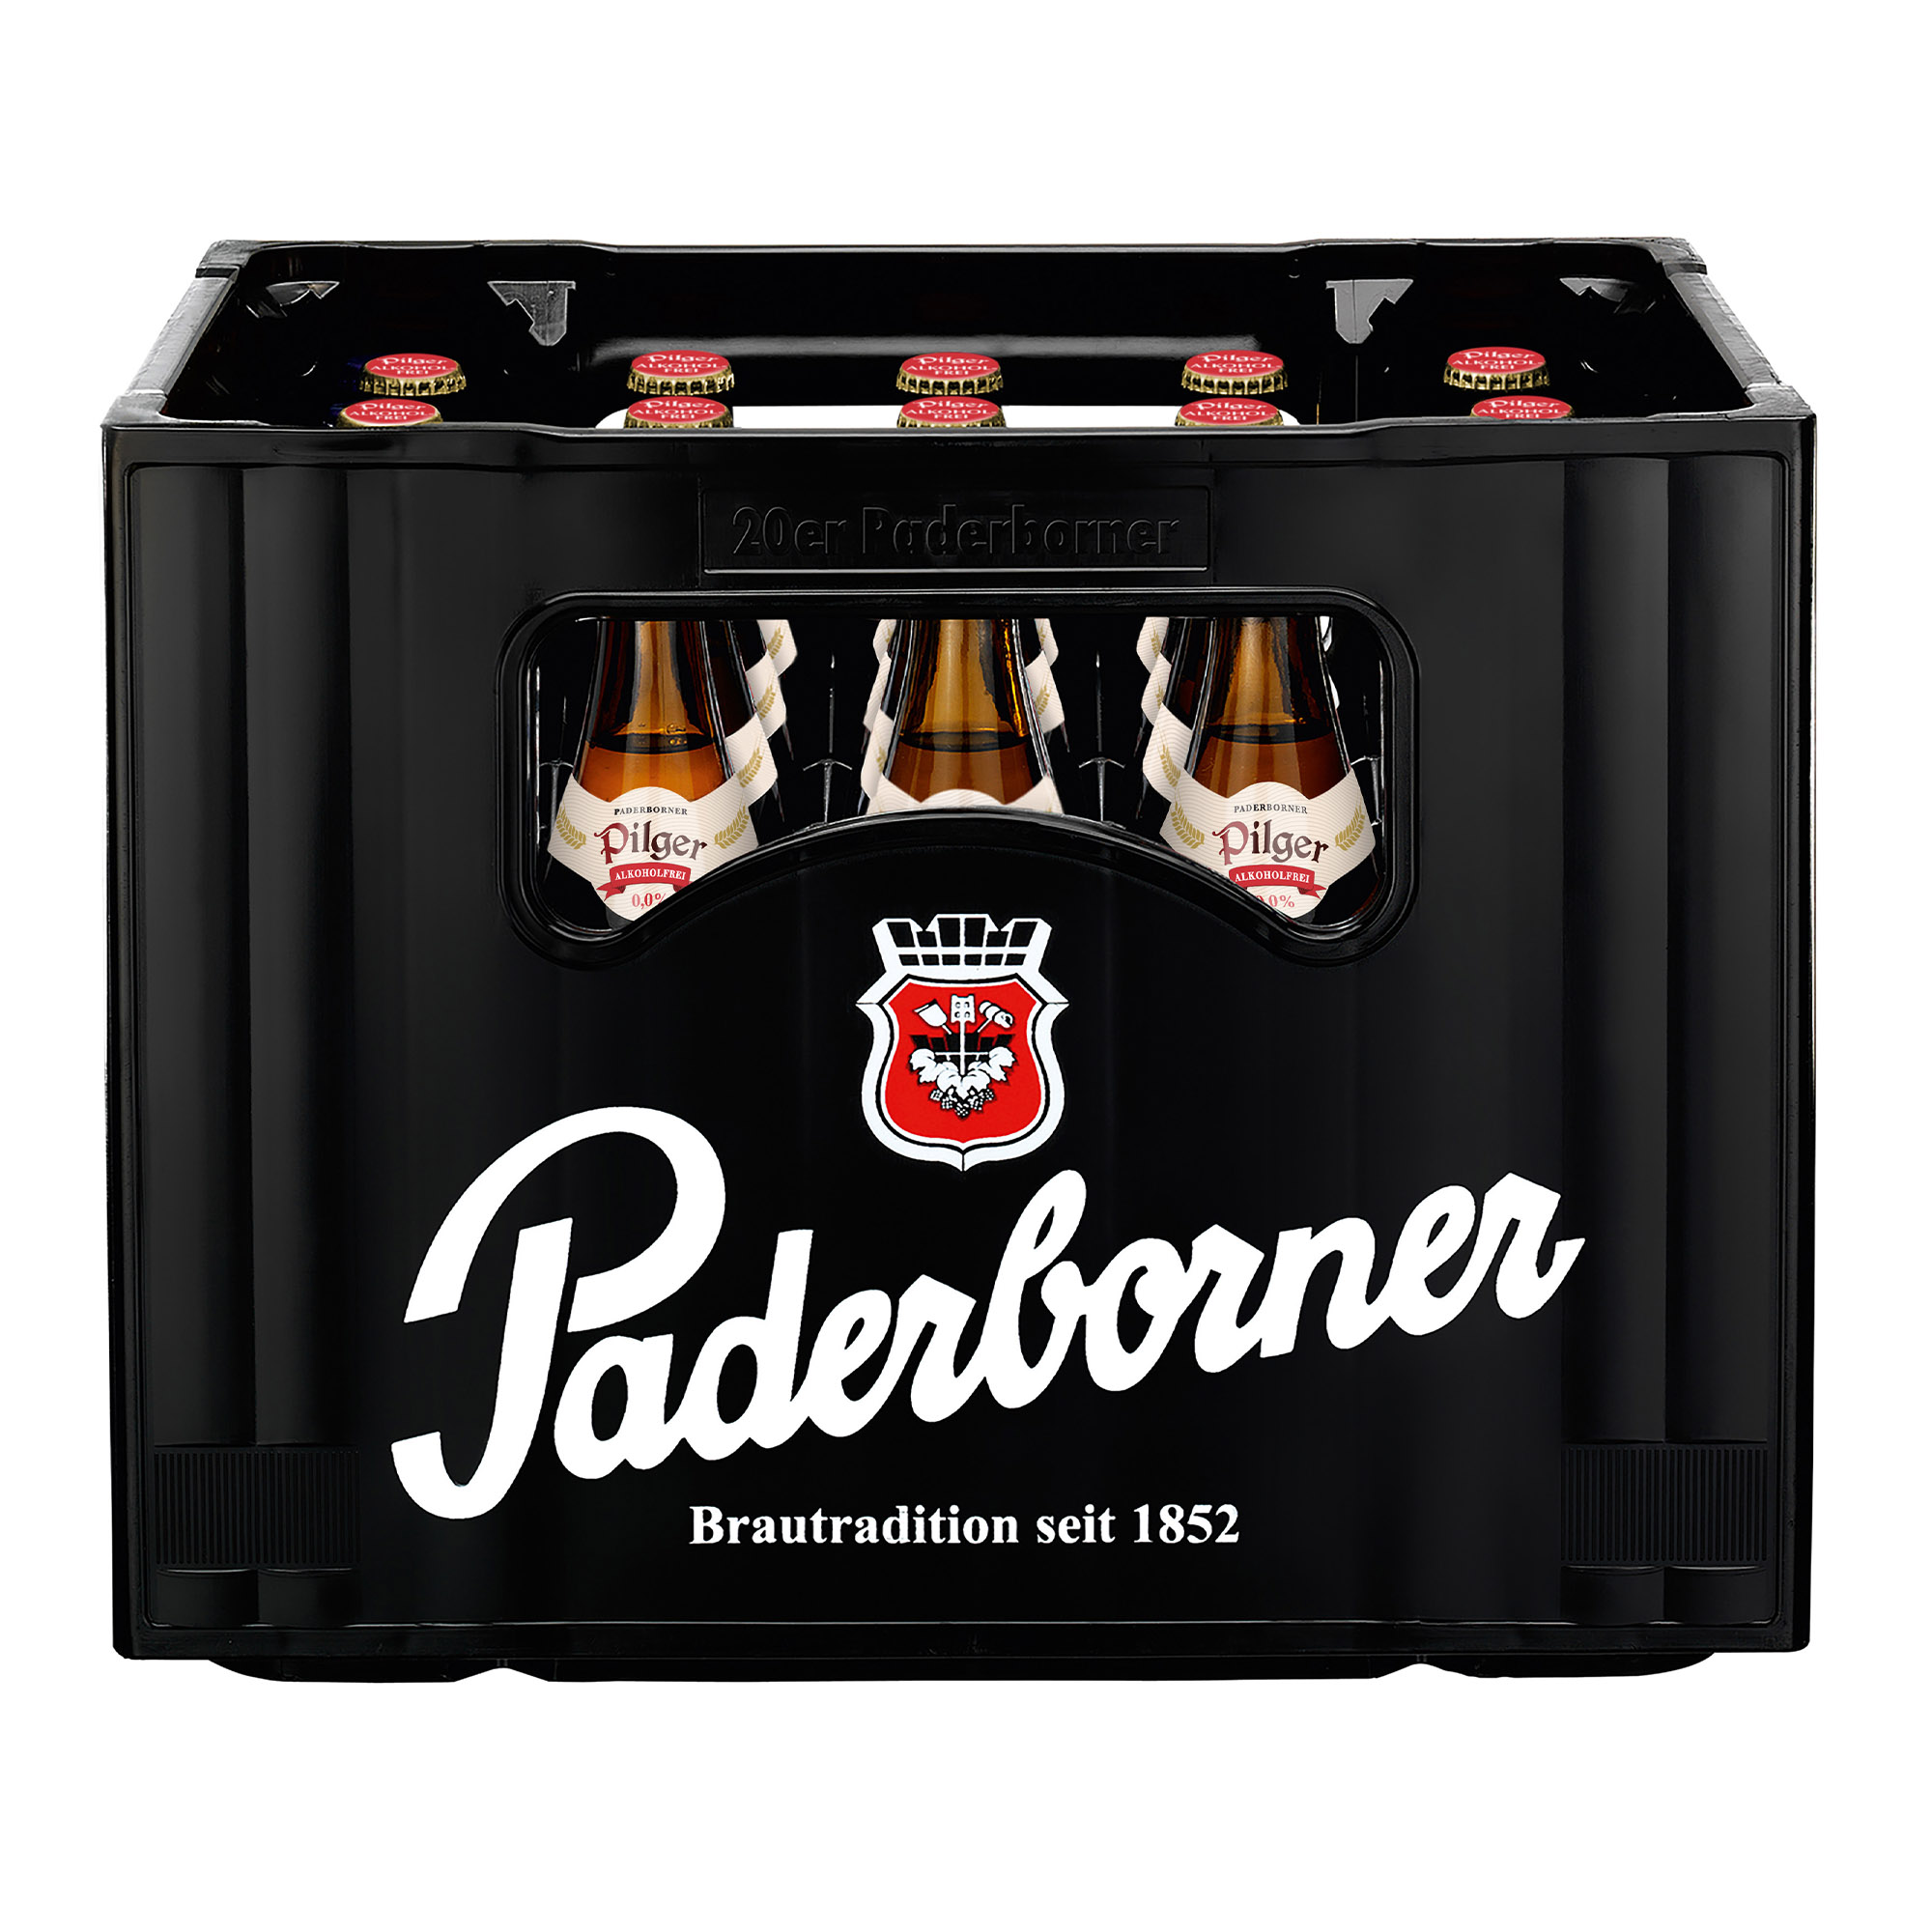 Produktabbildung Paderborner Pilger Alkoholfrei Kasten 20 x 0,5 l frontal